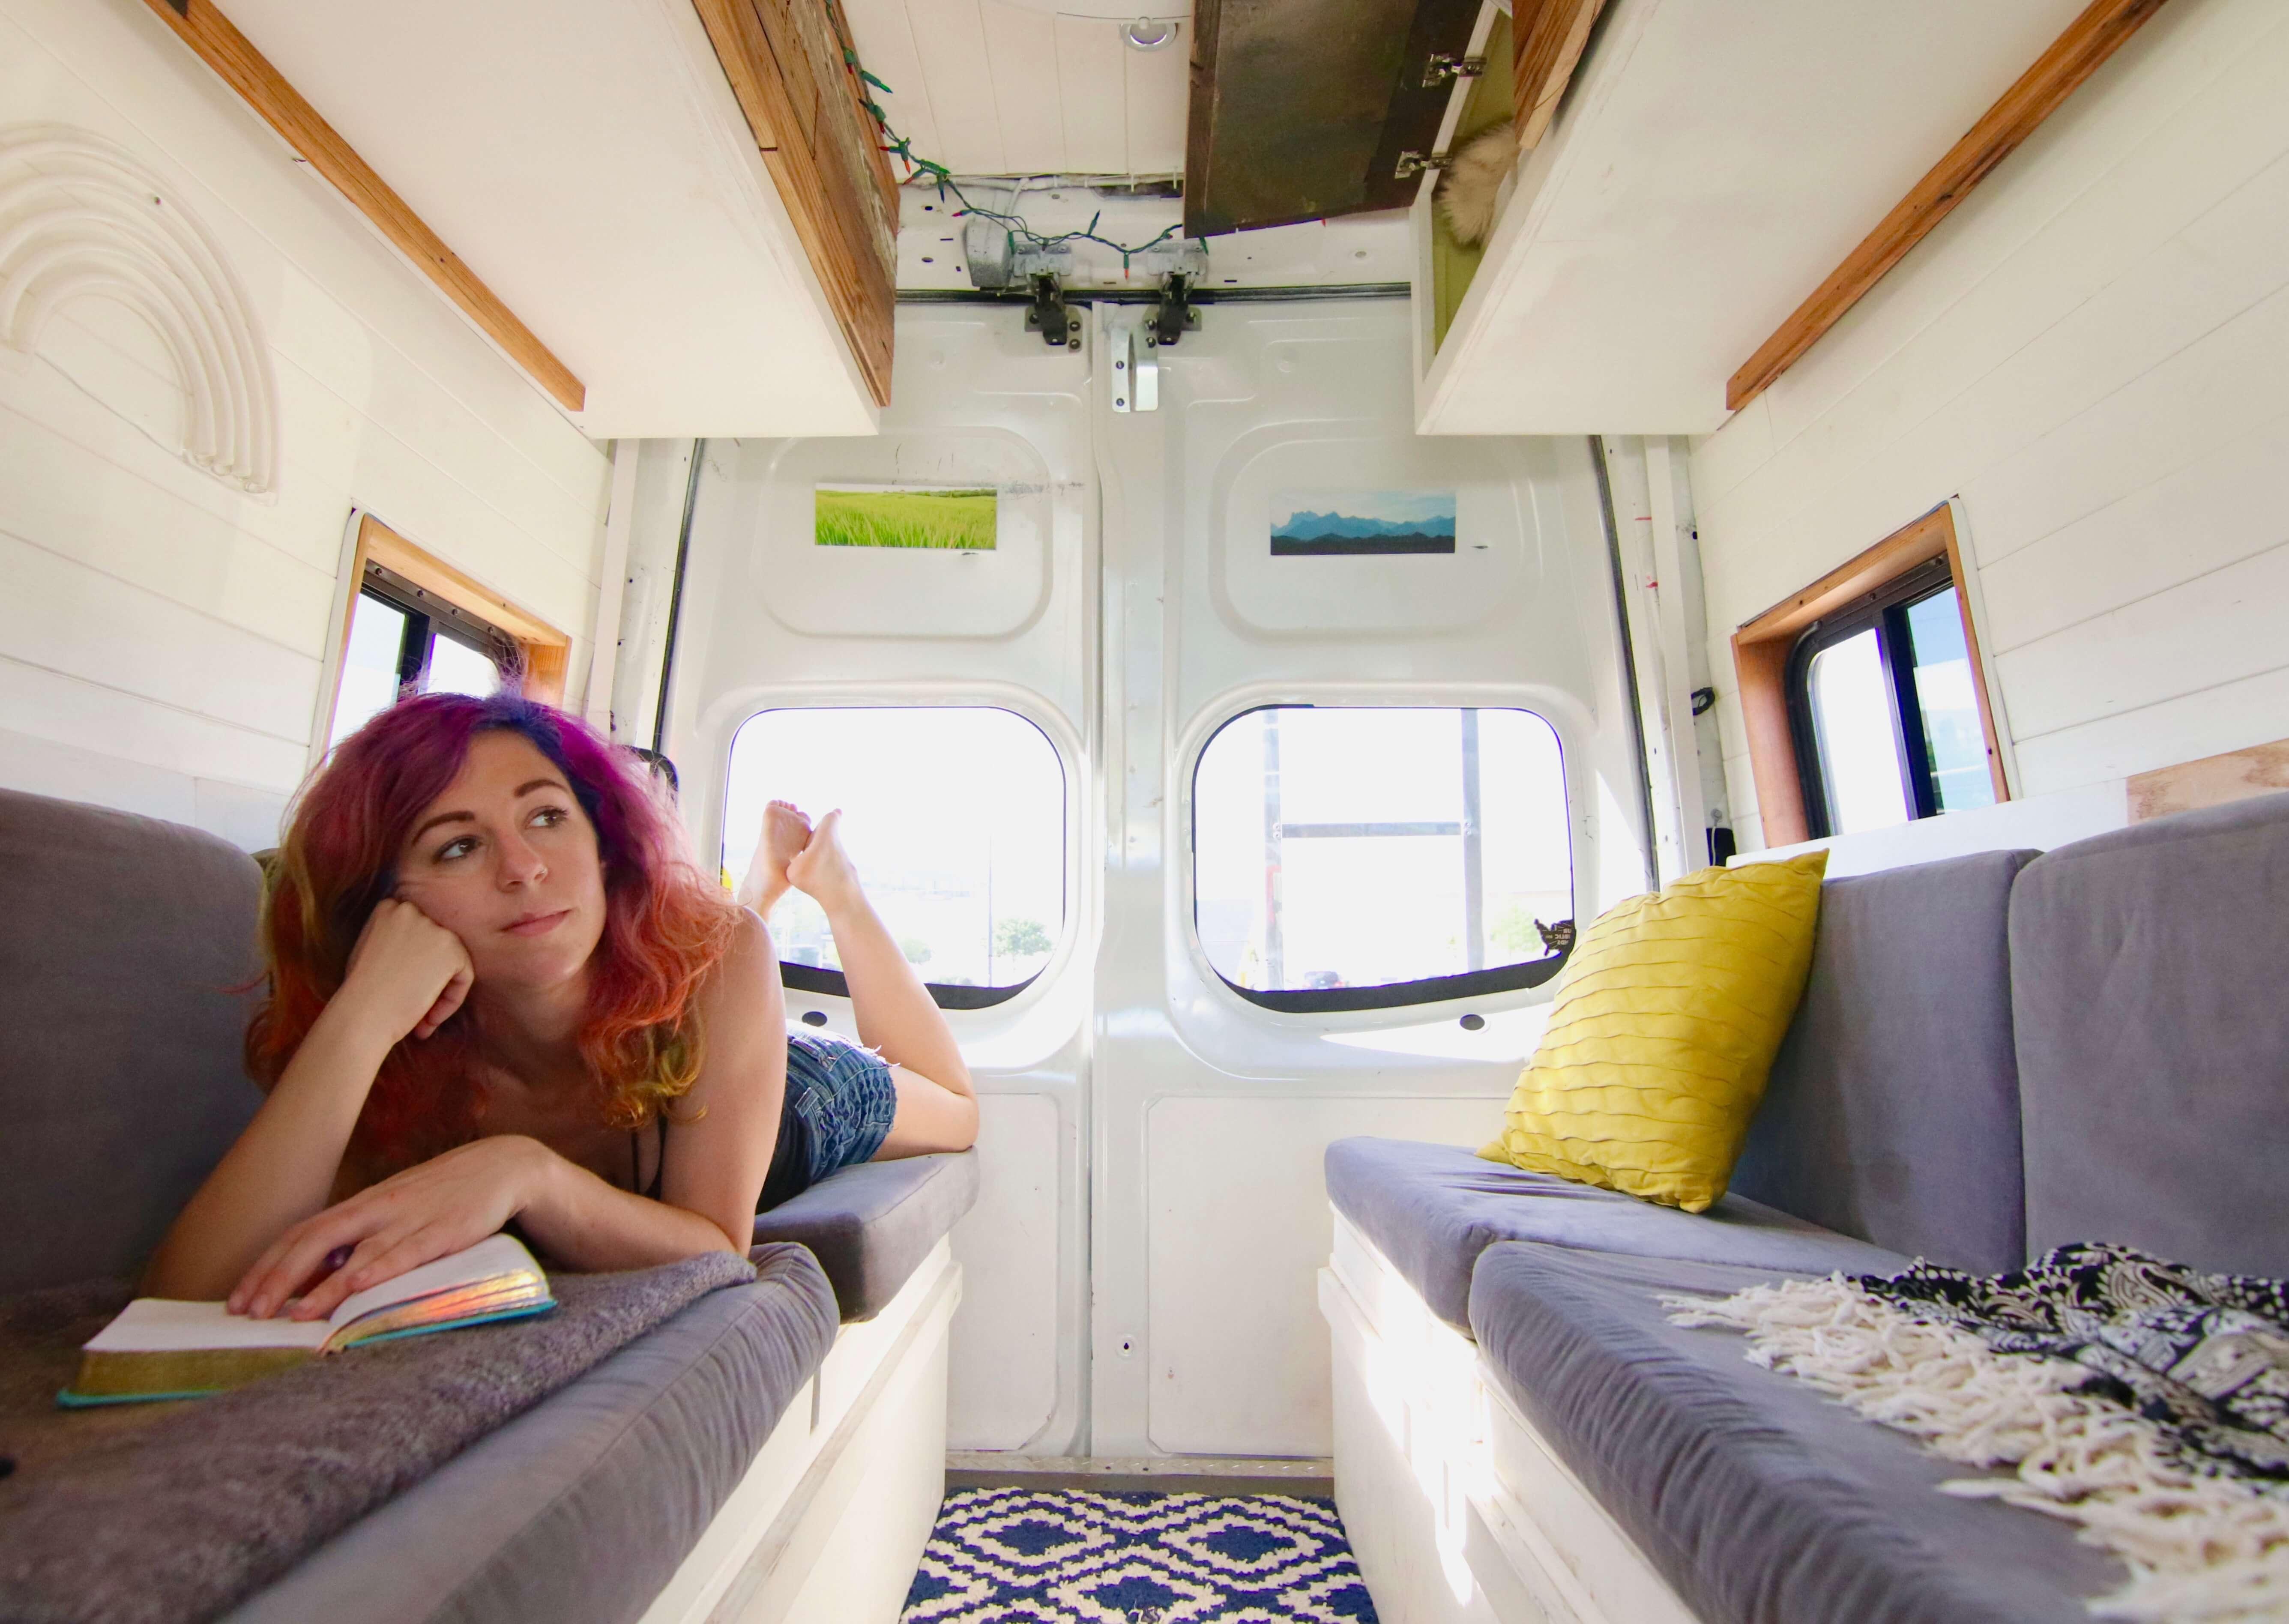 vanlife travel solo female blog instagram blogger vlog vacay vans